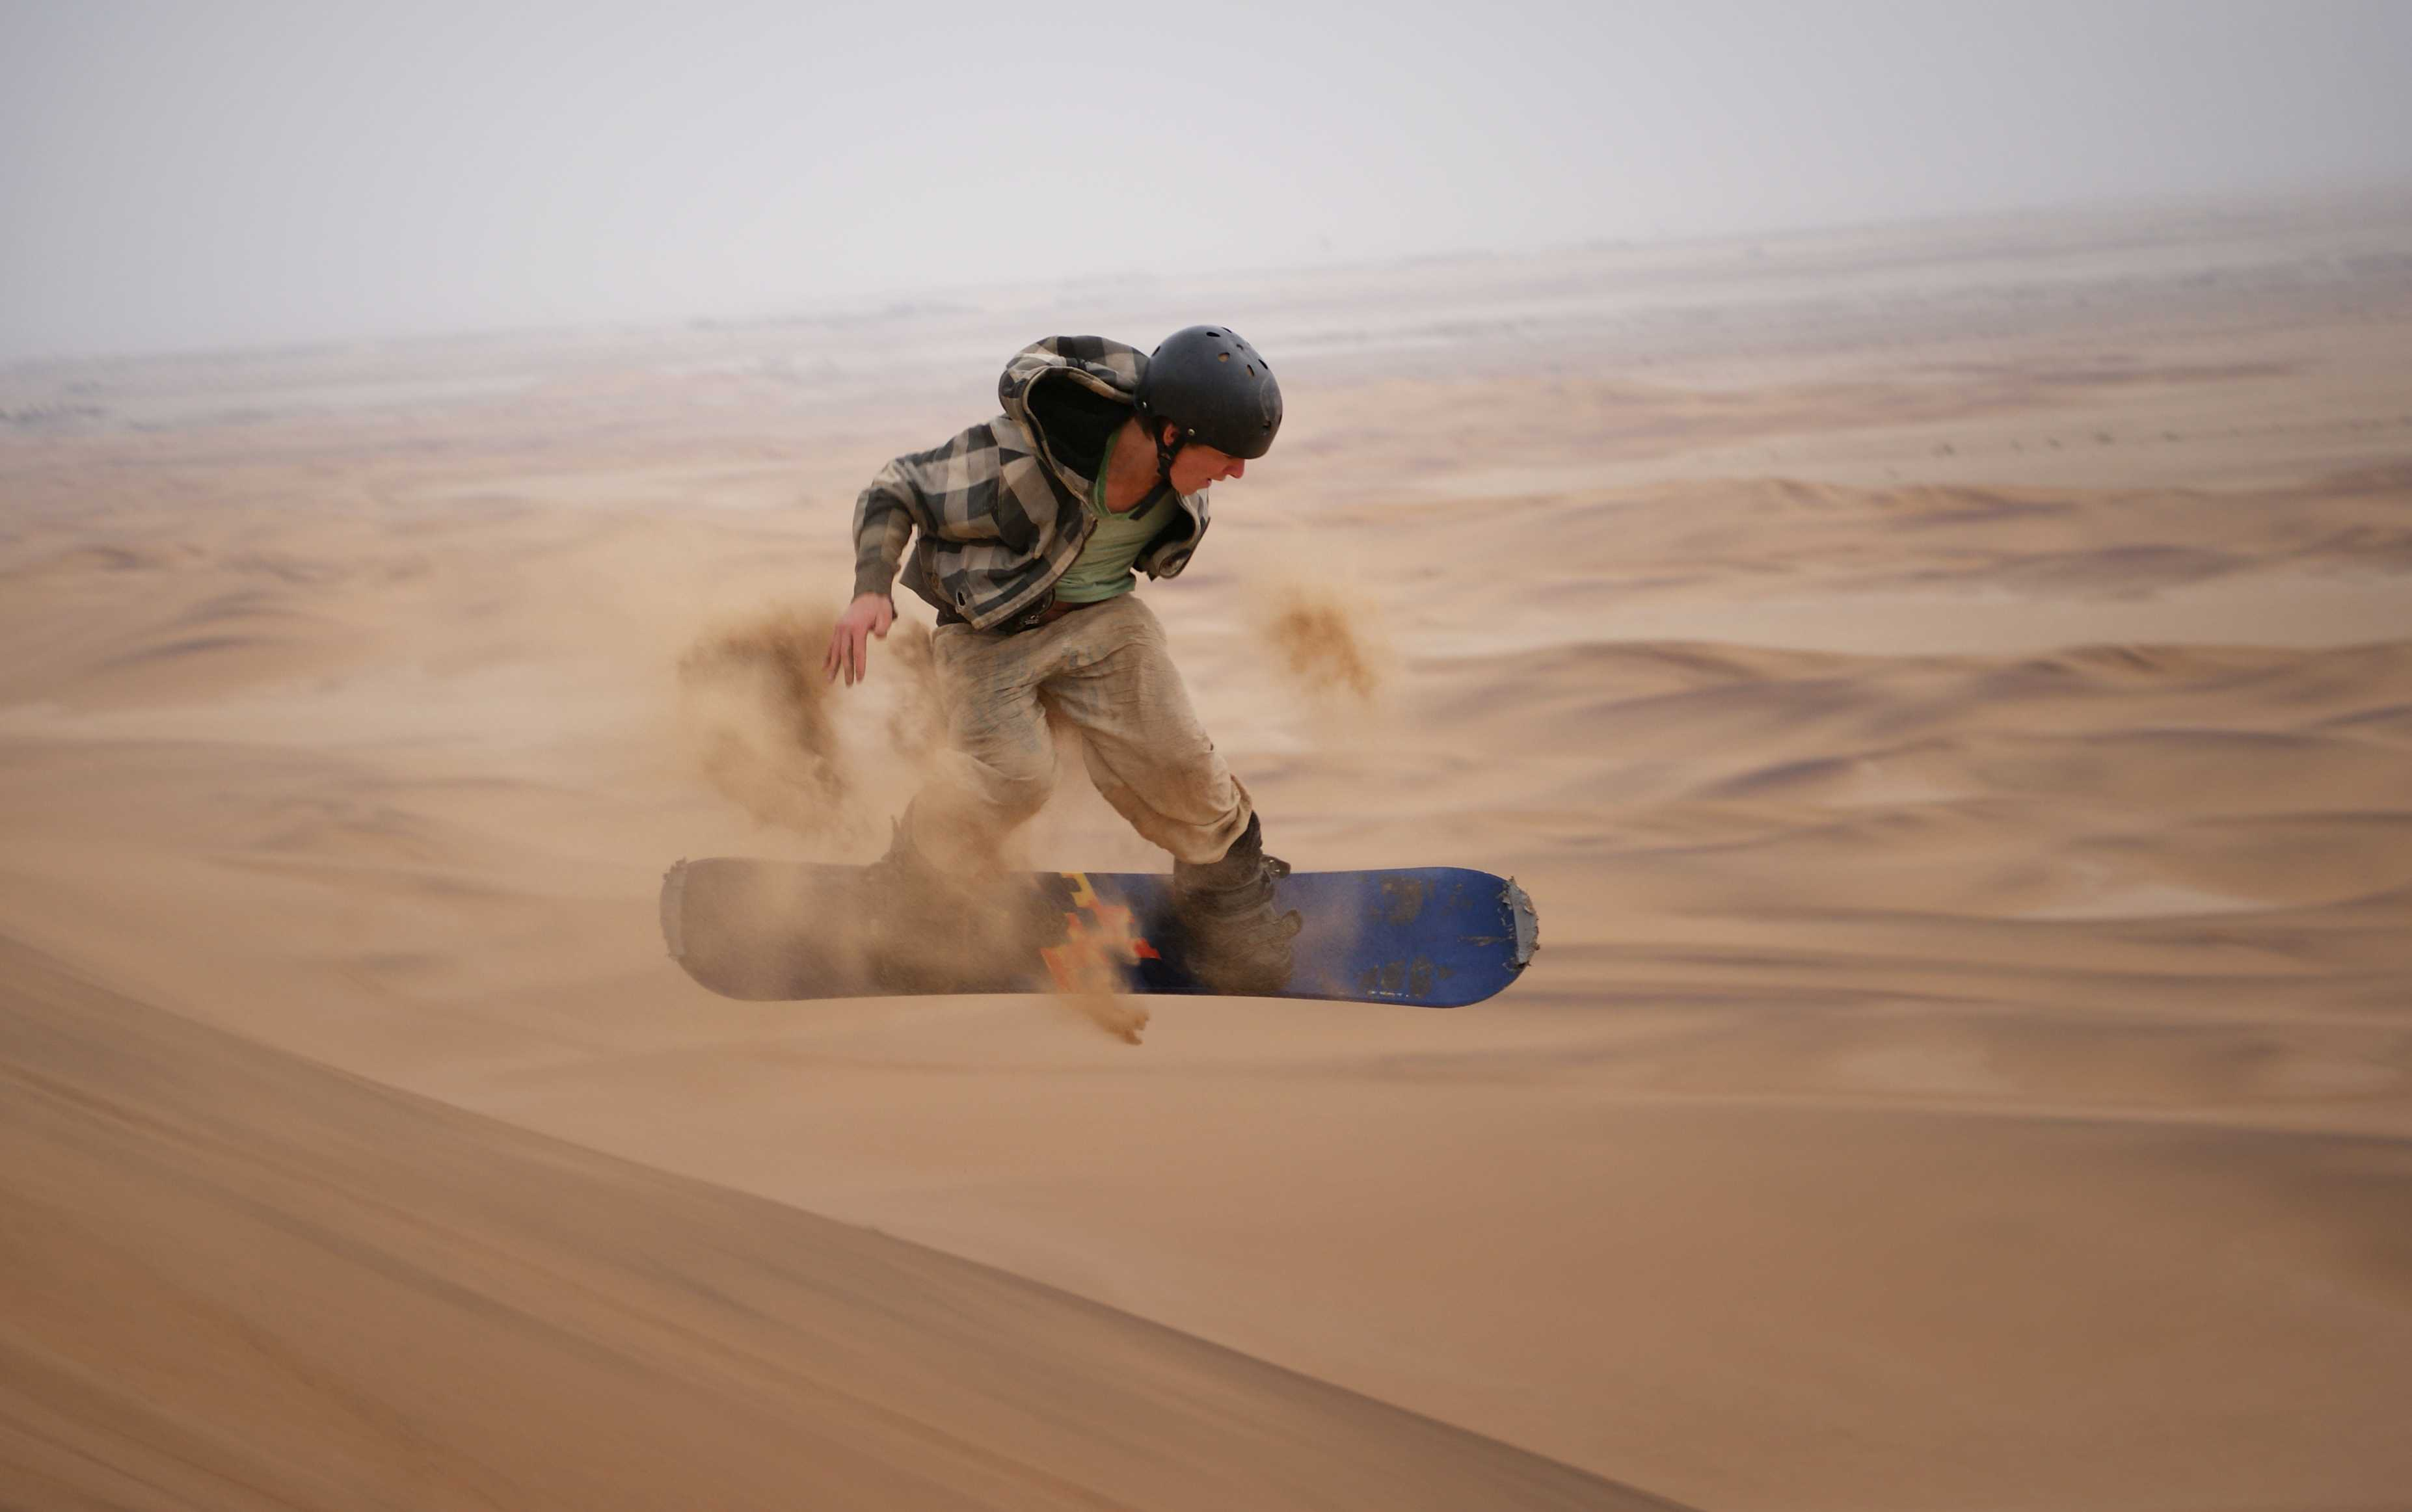 guy sandboarding in namib desert